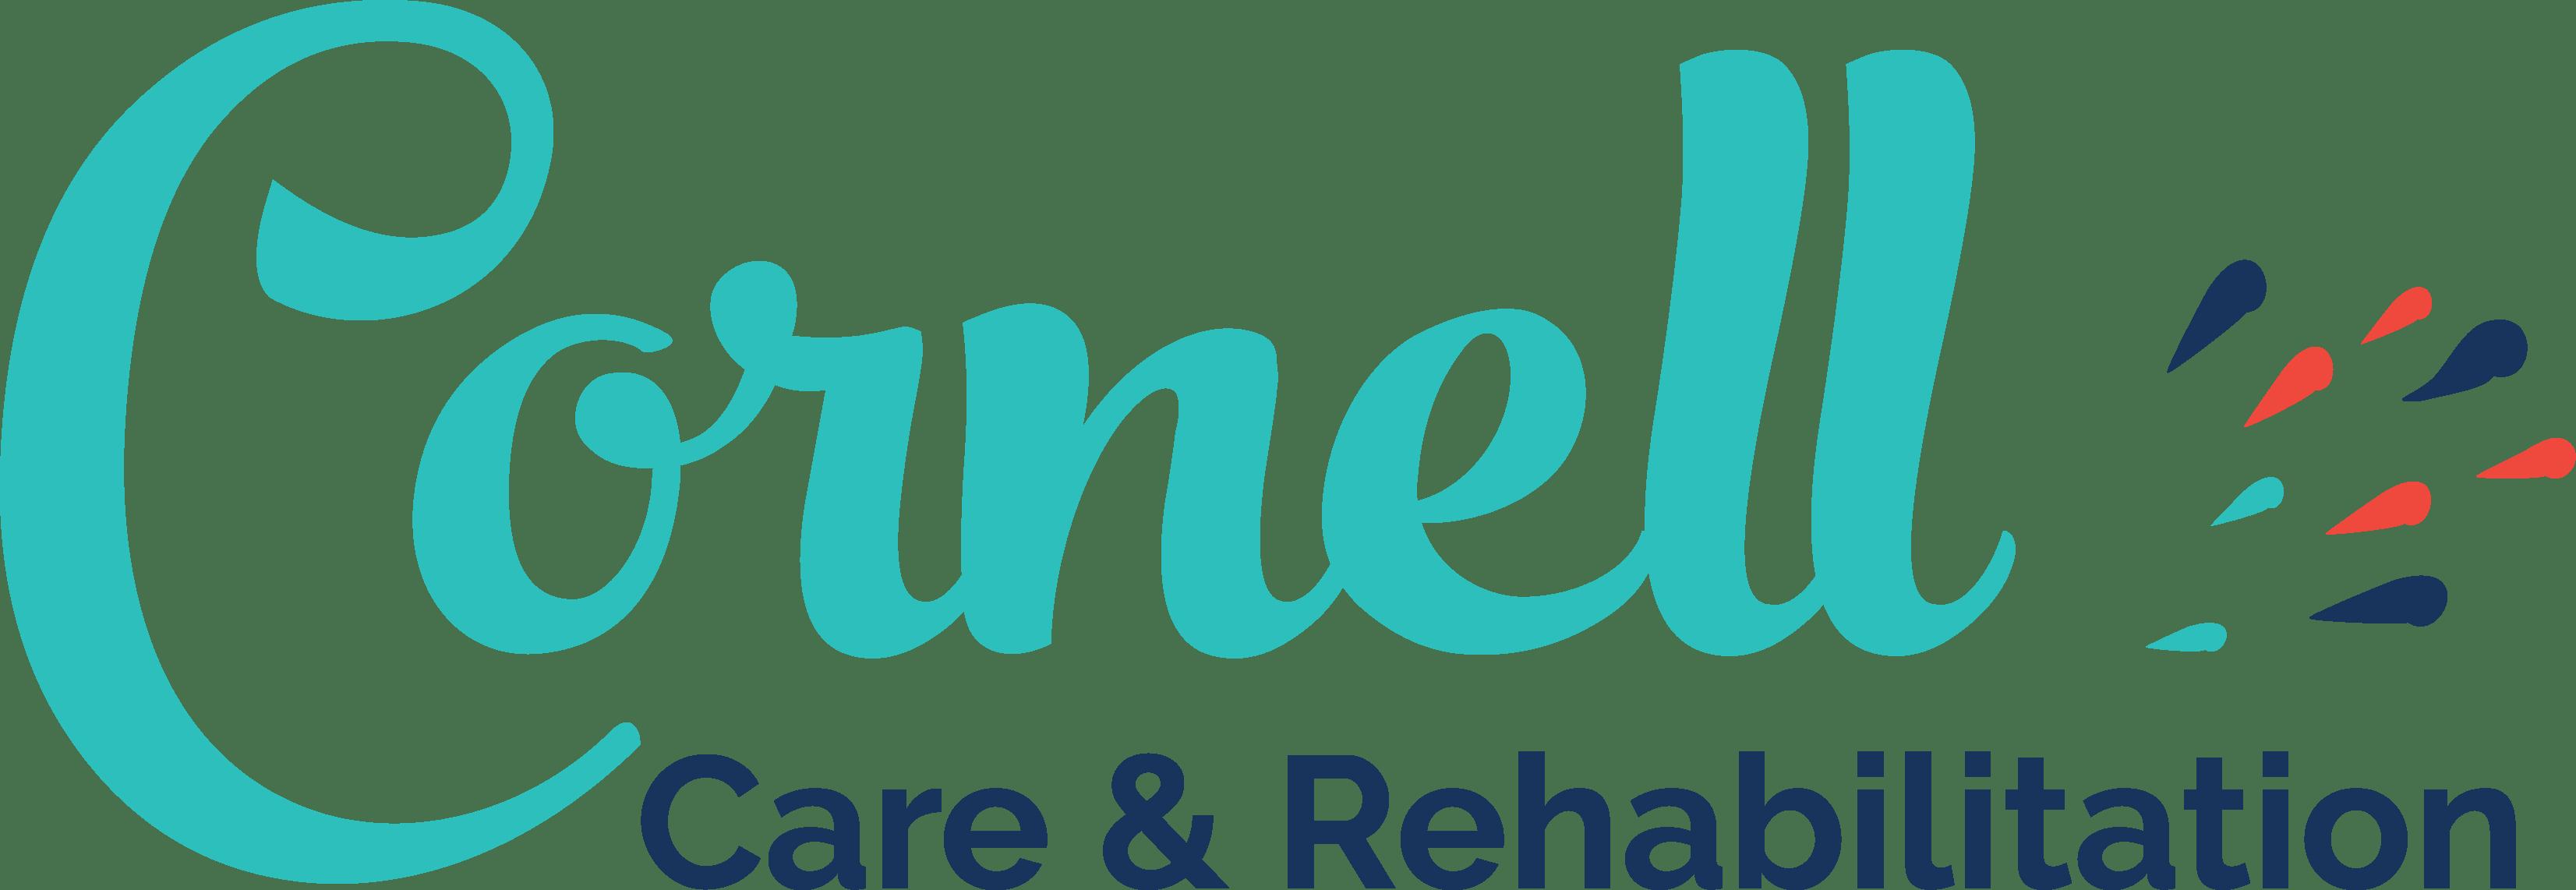 Logo: Cornell Care & Rehabilitation CCNJ Sponsor